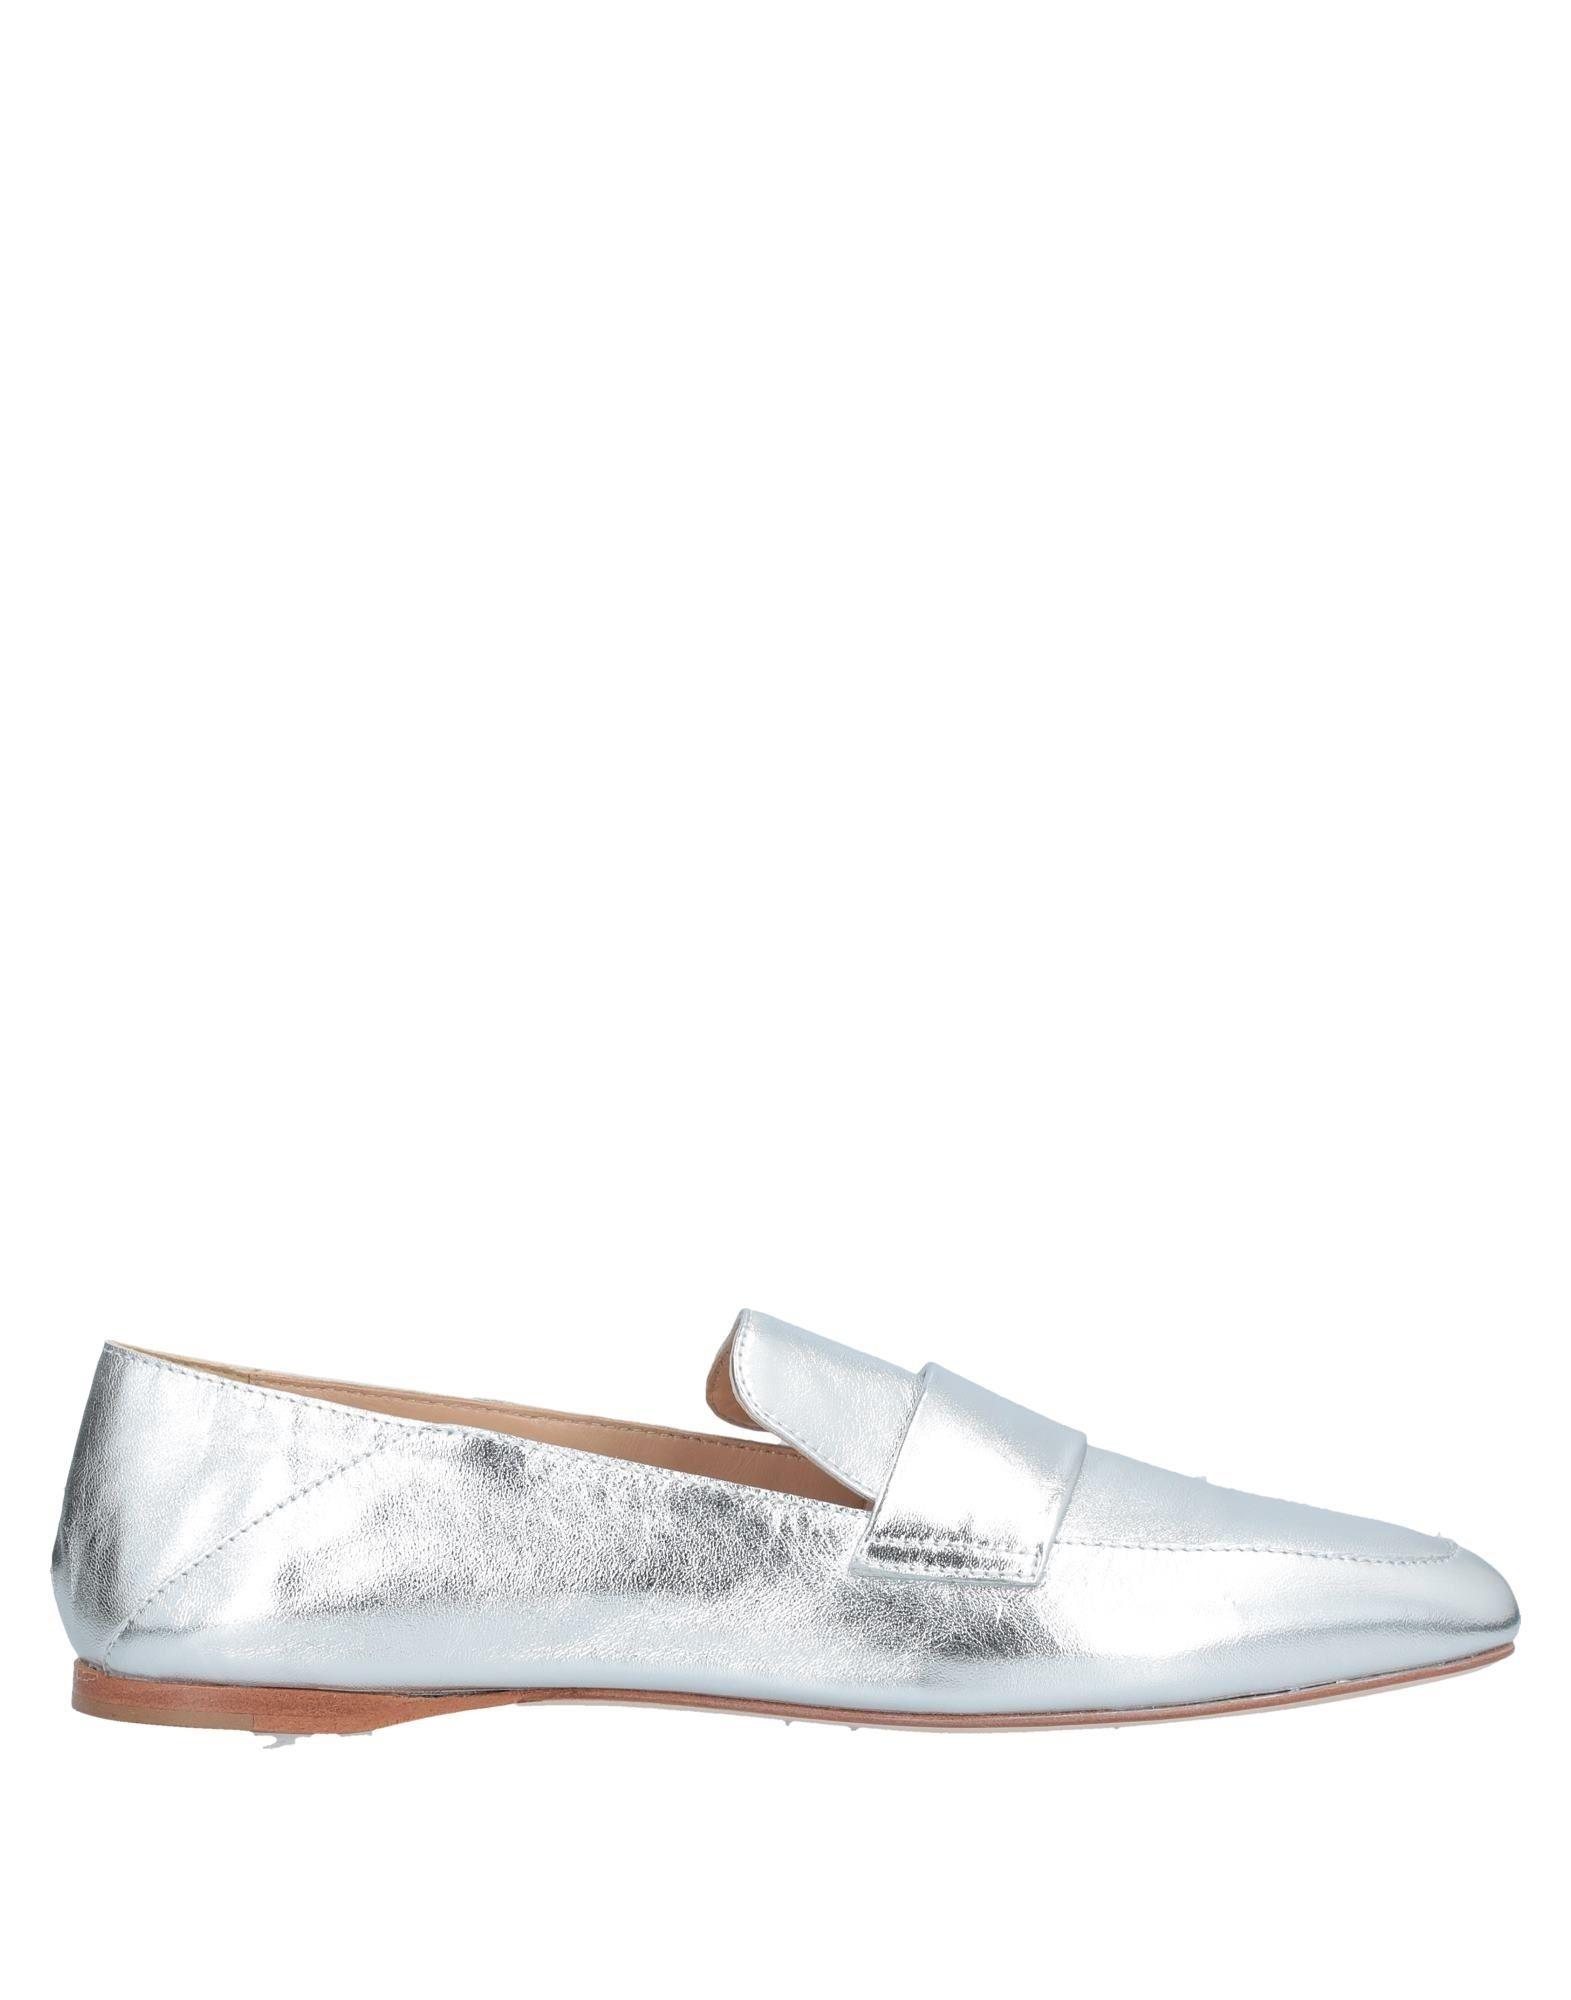 Fabio Rusconi Mokassins Damen  11497572RL Gute Qualität beliebte Schuhe